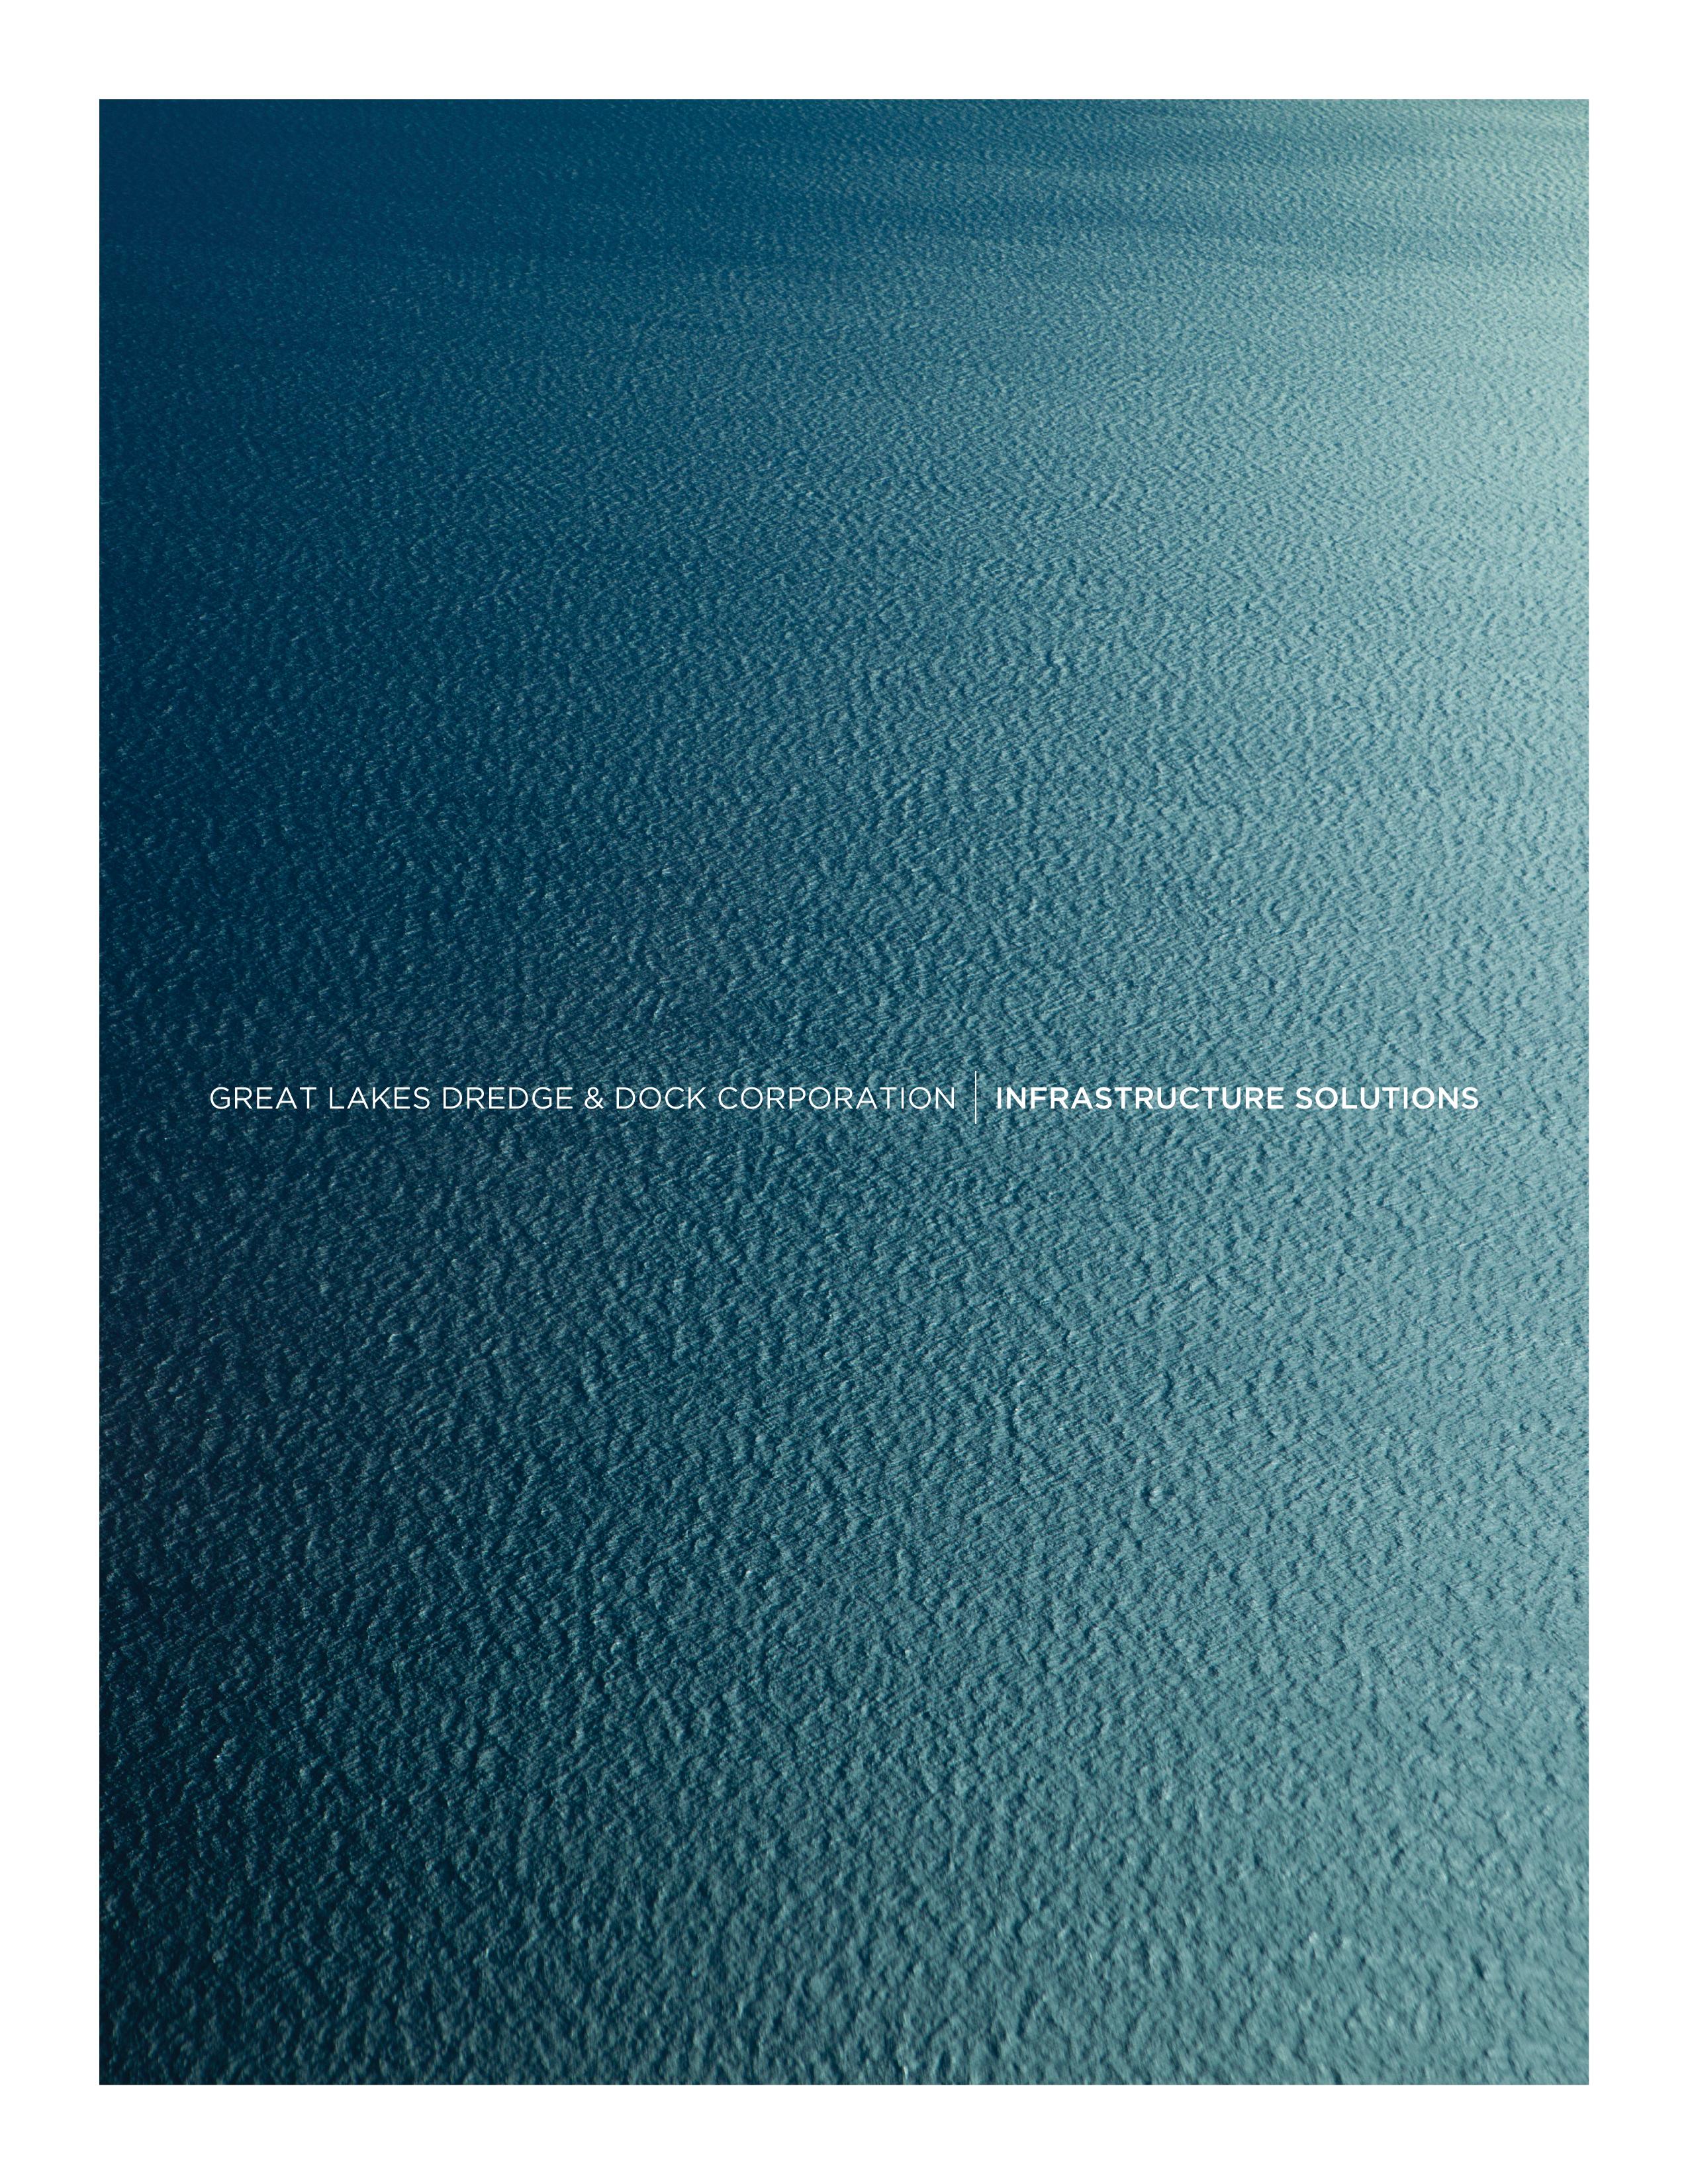 GLDD_Corporate Brochure-01